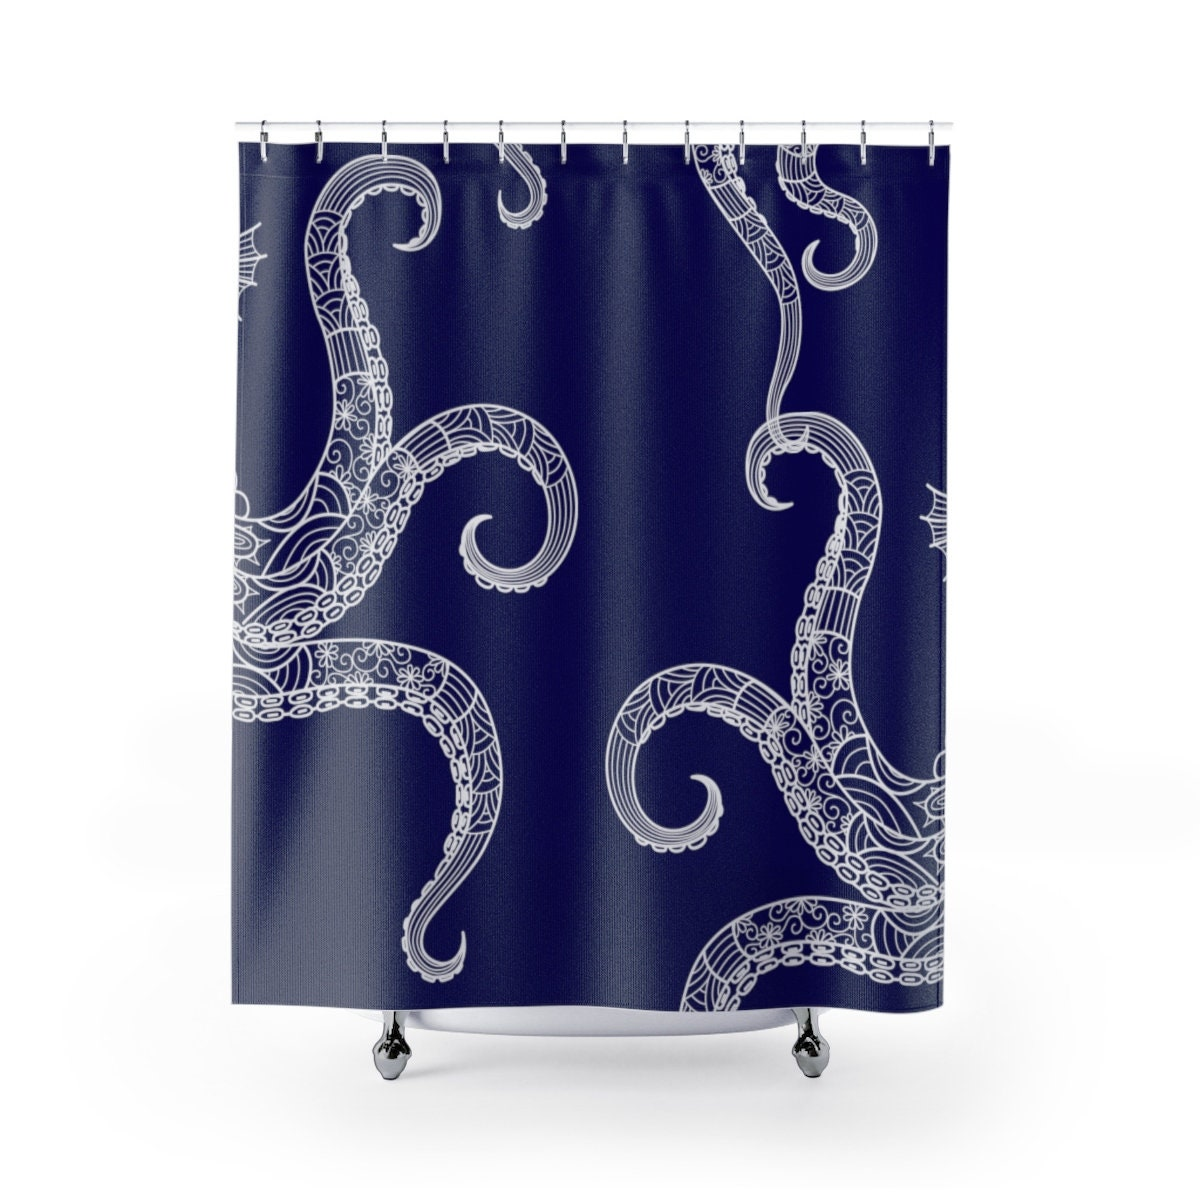 Octopus Shower Curtain Unique Bath Curtain Bathroom Decor